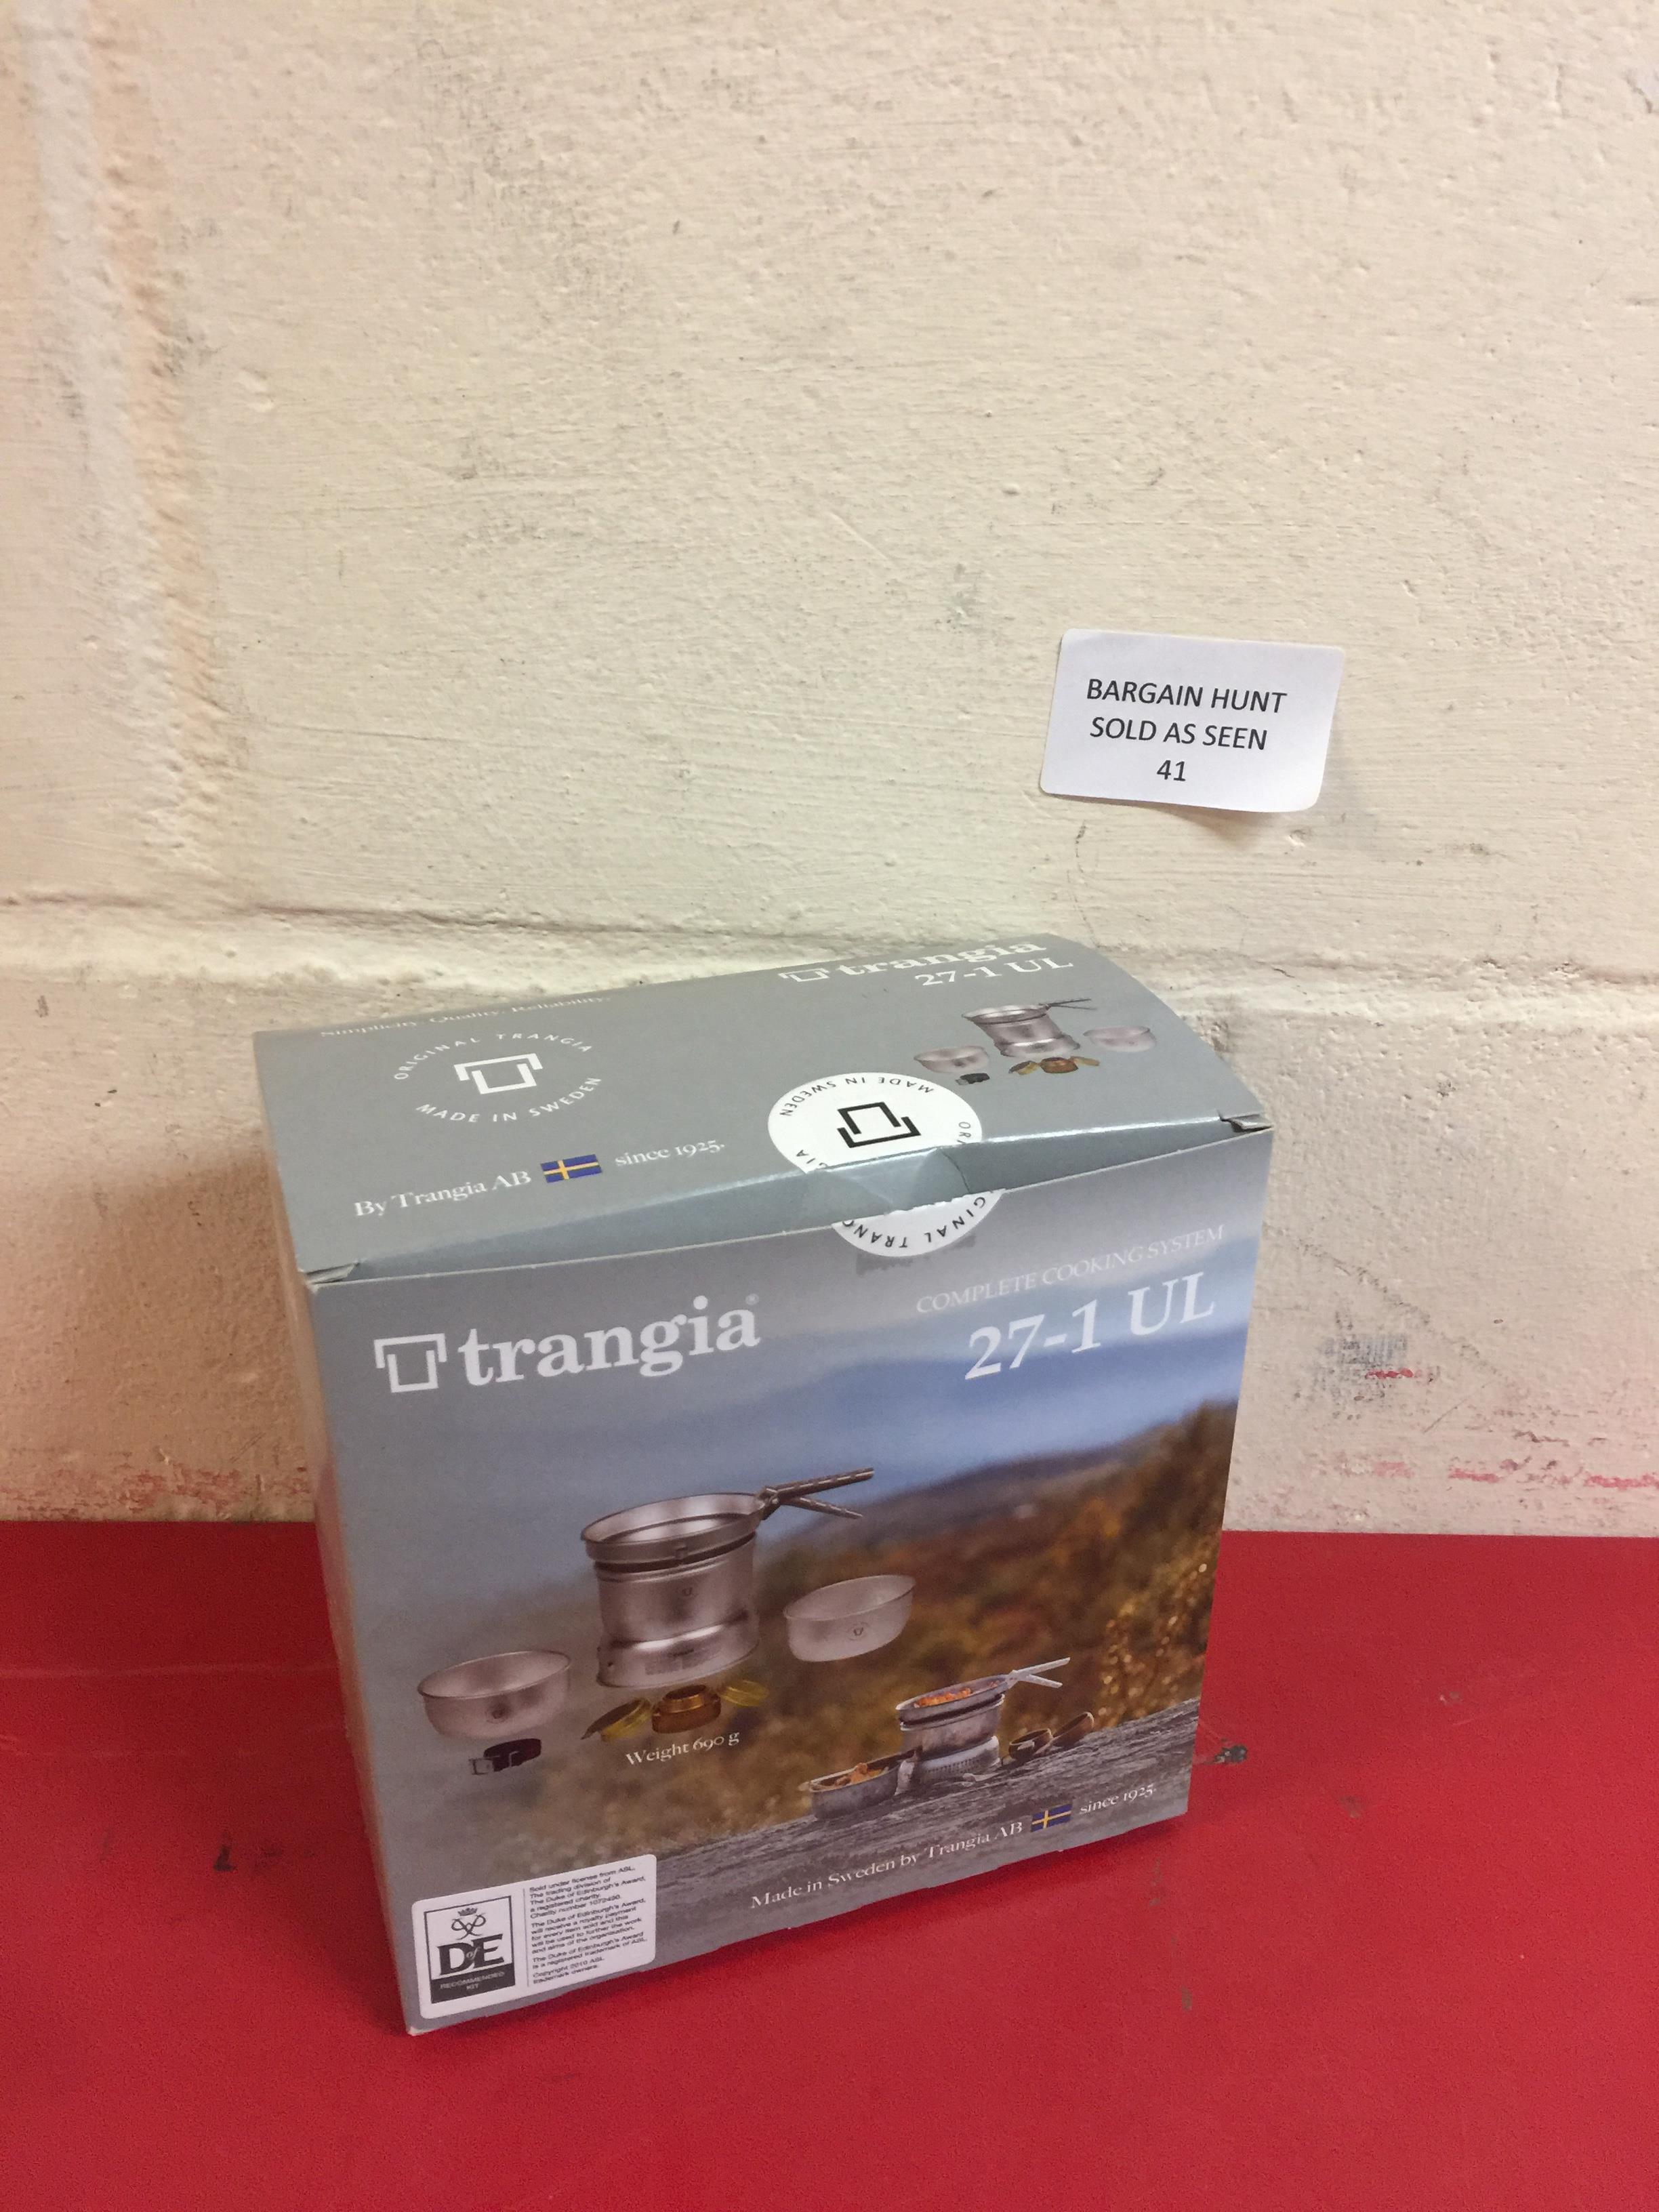 Lot 41 - Trangia 27 Cookset with Spirit Burner RRP £44.99